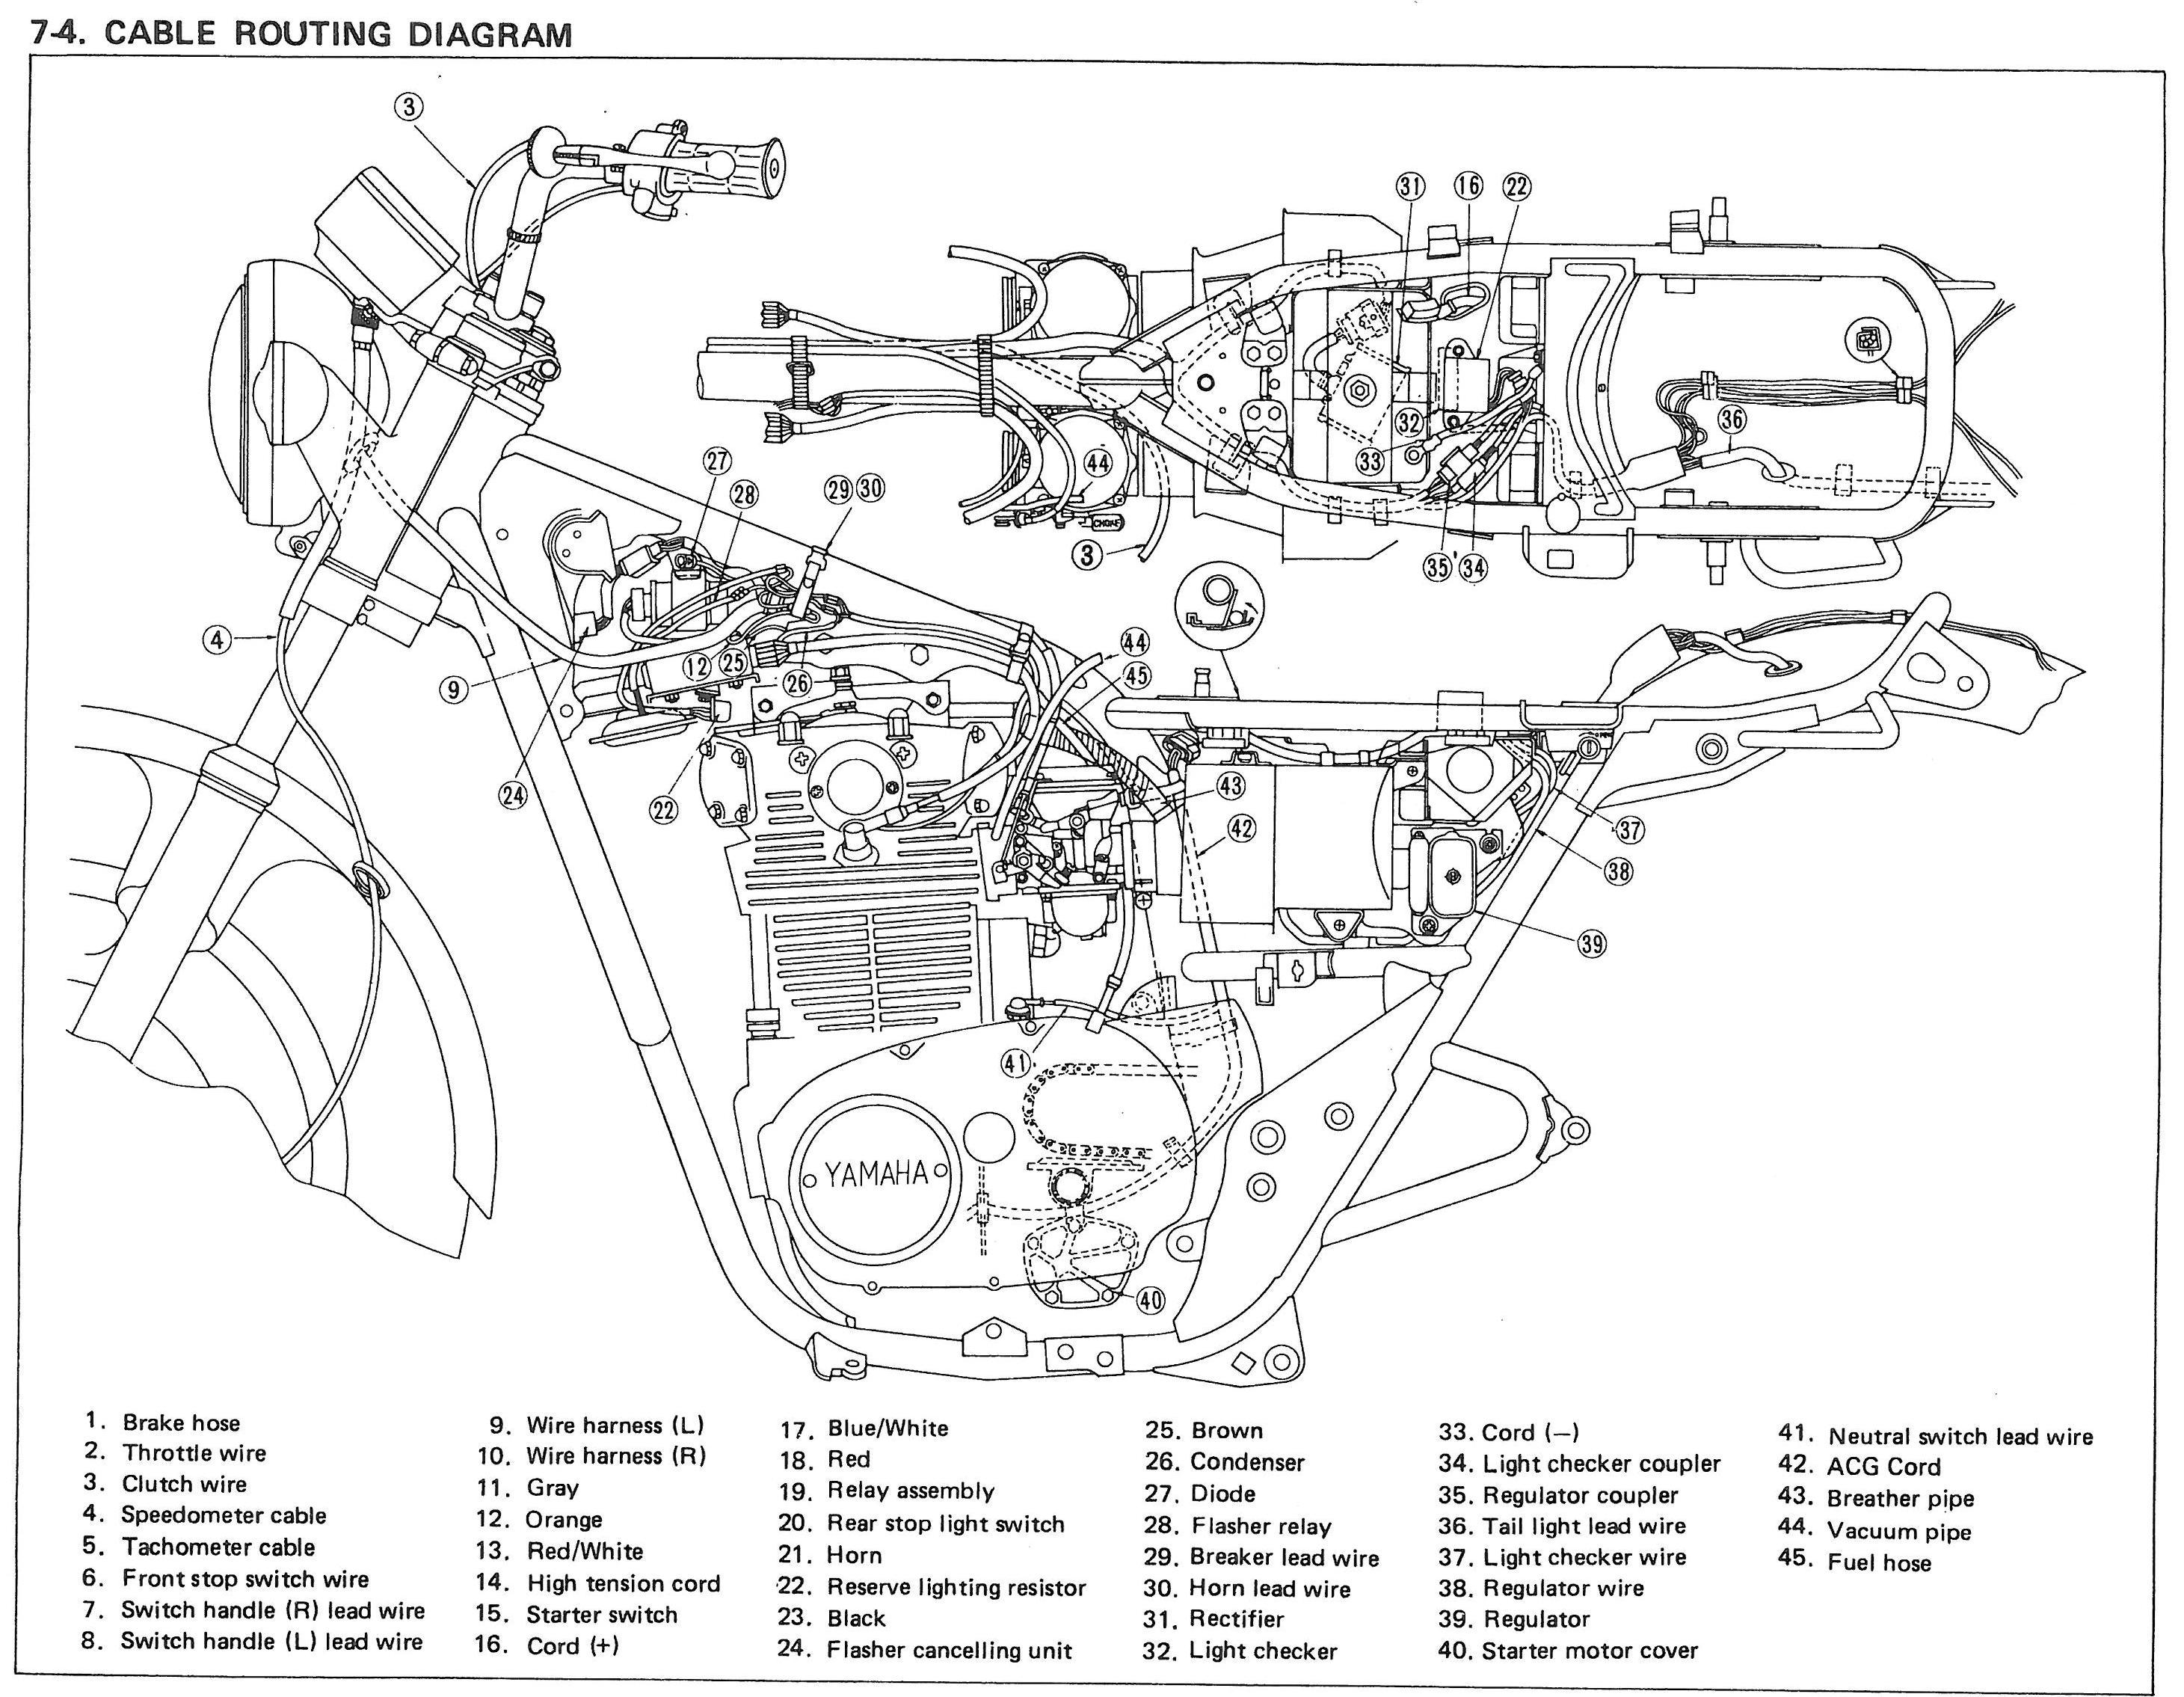 xs650 oil diagram schematics wiring diagrams u2022 rh  seniorlivinguniversity co XS650 Carburetor Diagram yamaha xs650 engine  diagram